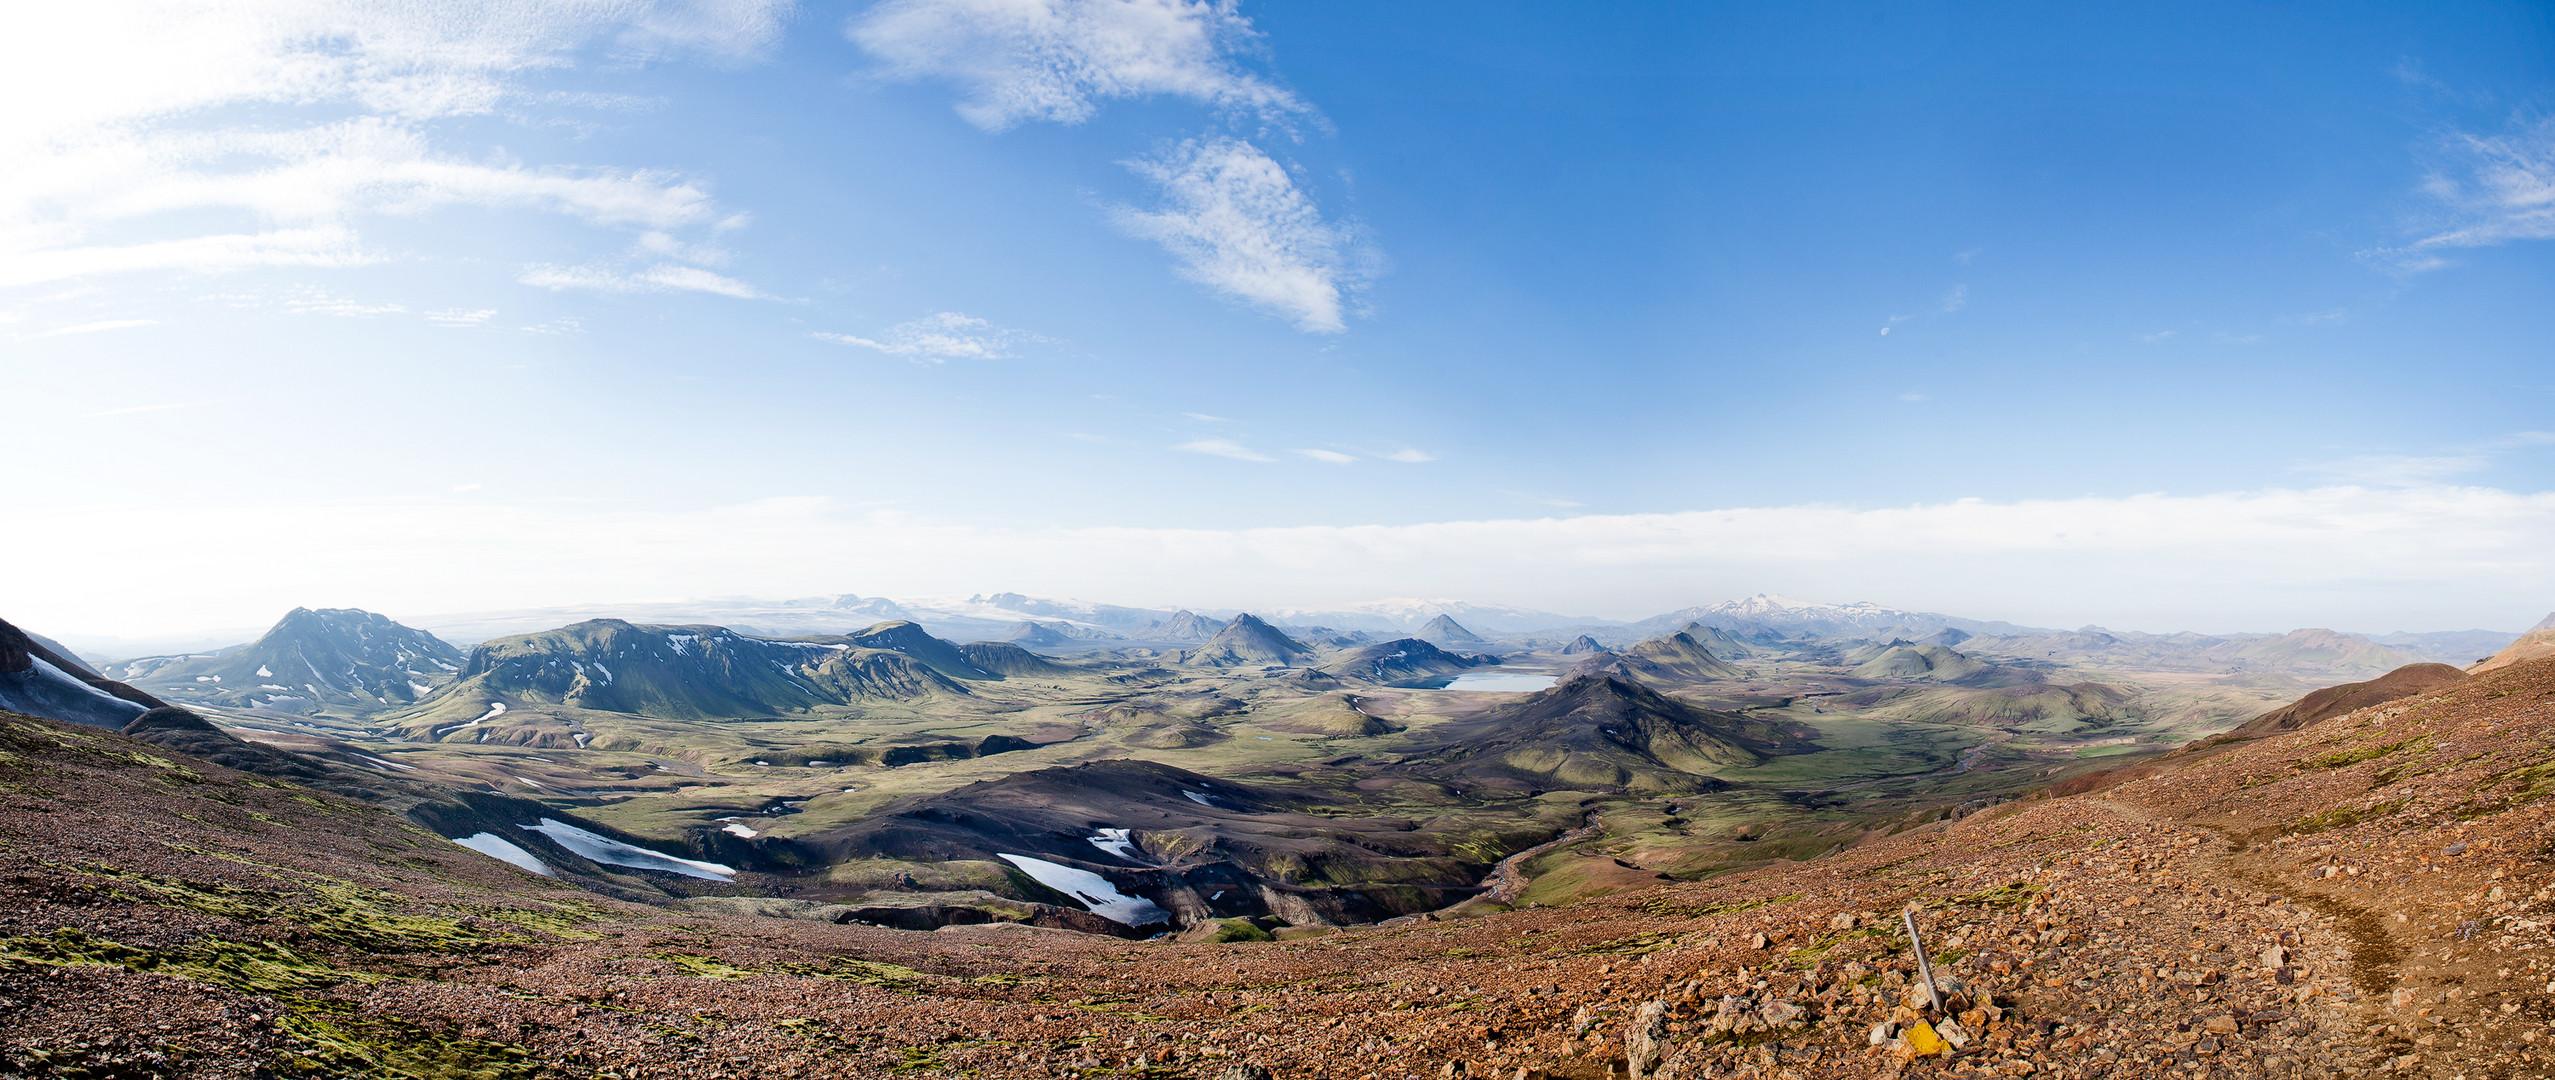 Panorama MYrdalsjökull / Eyjafjallajökull